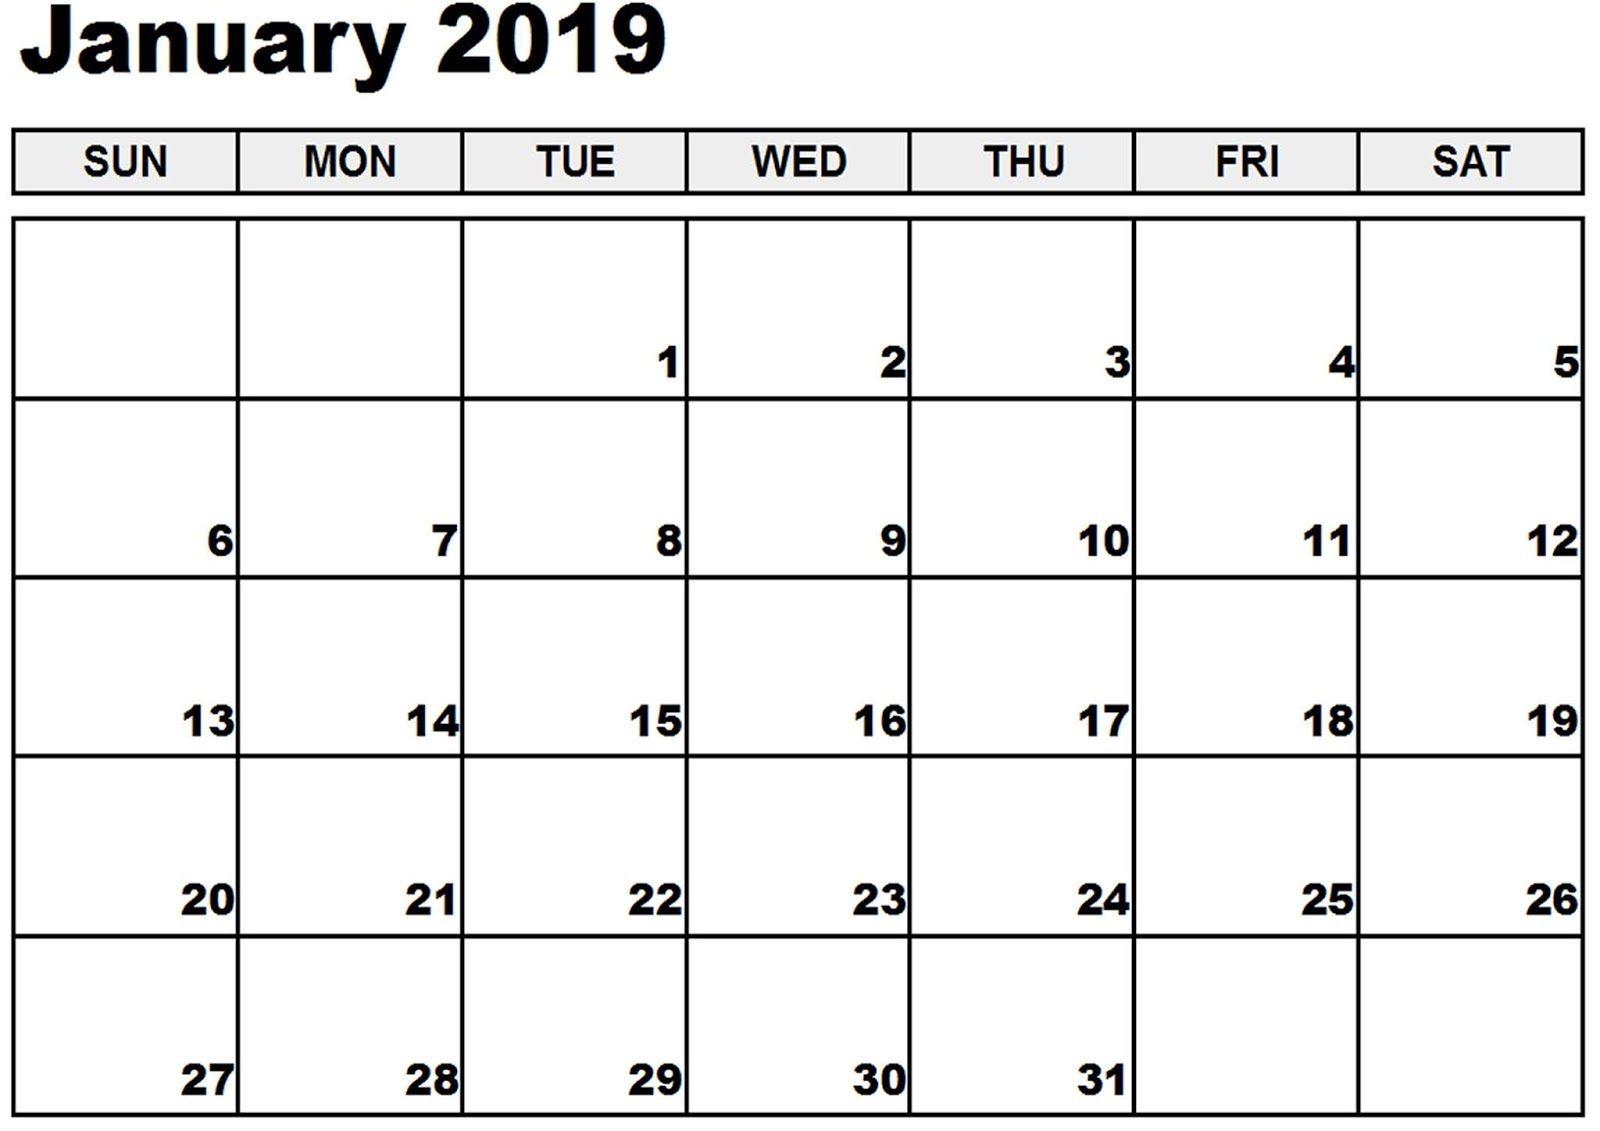 January Calendar 2019 Word #january2019 #january within November Calendar Templates Editable